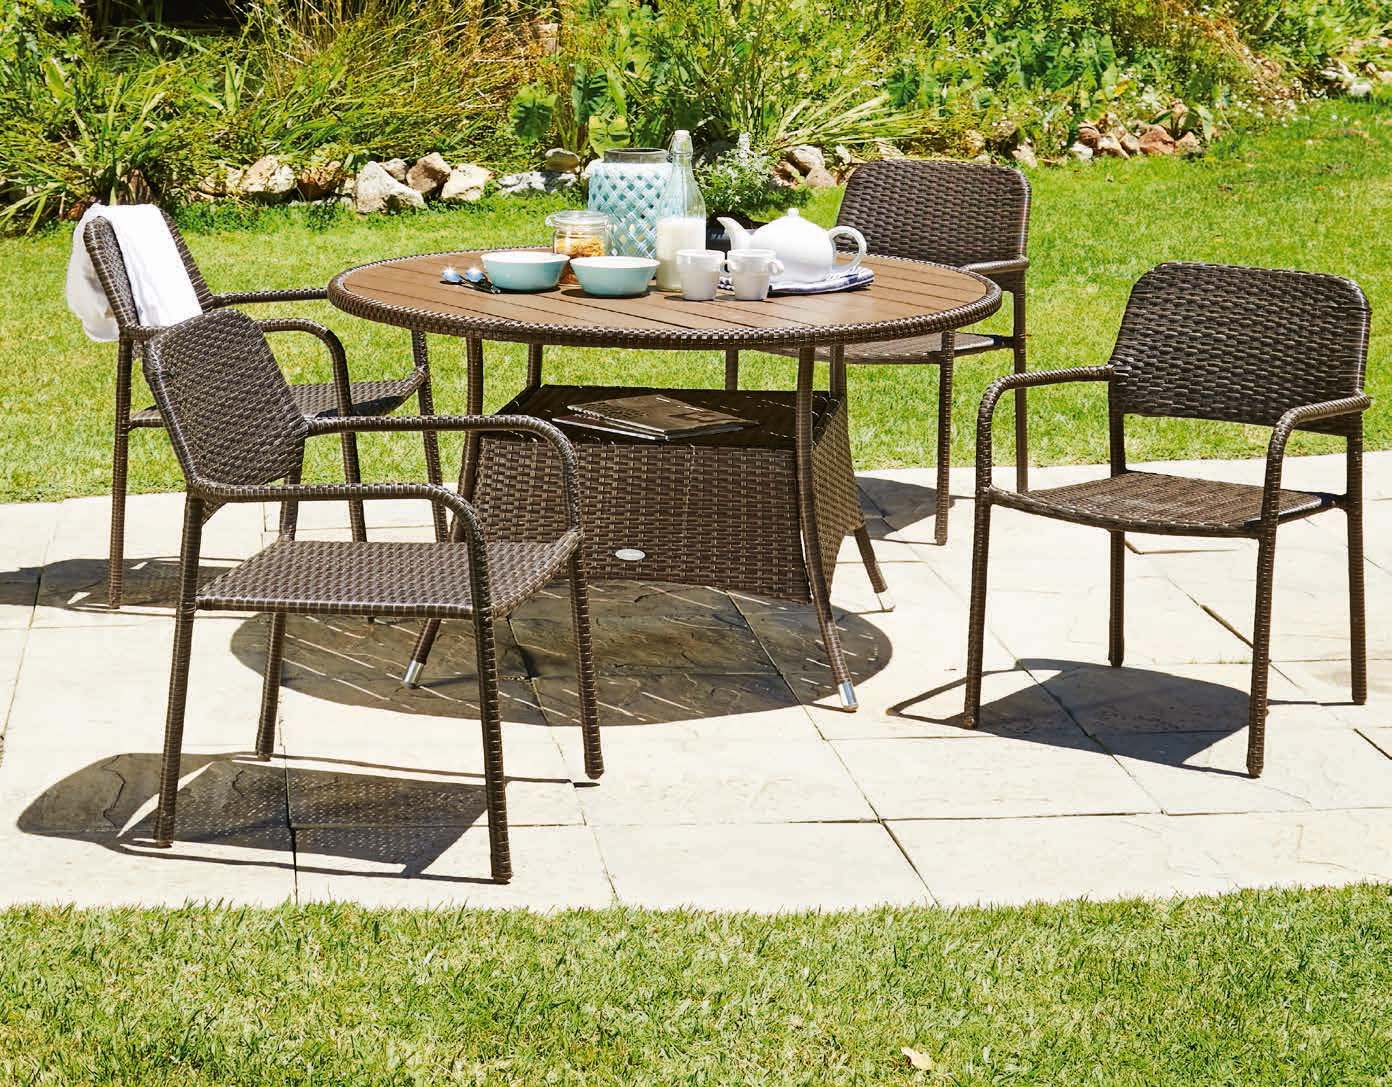 Stół Strib + 4 krzesła Fauske